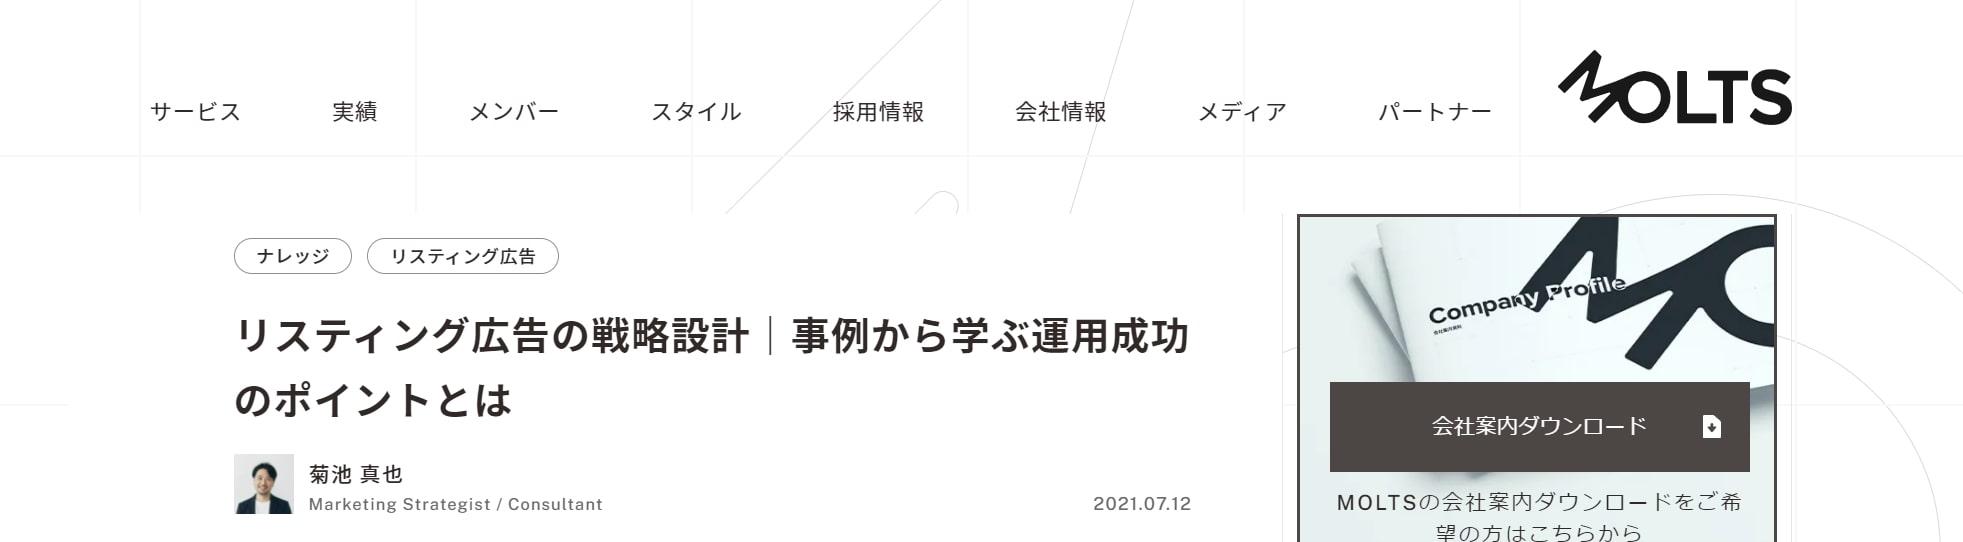 image18.jpg